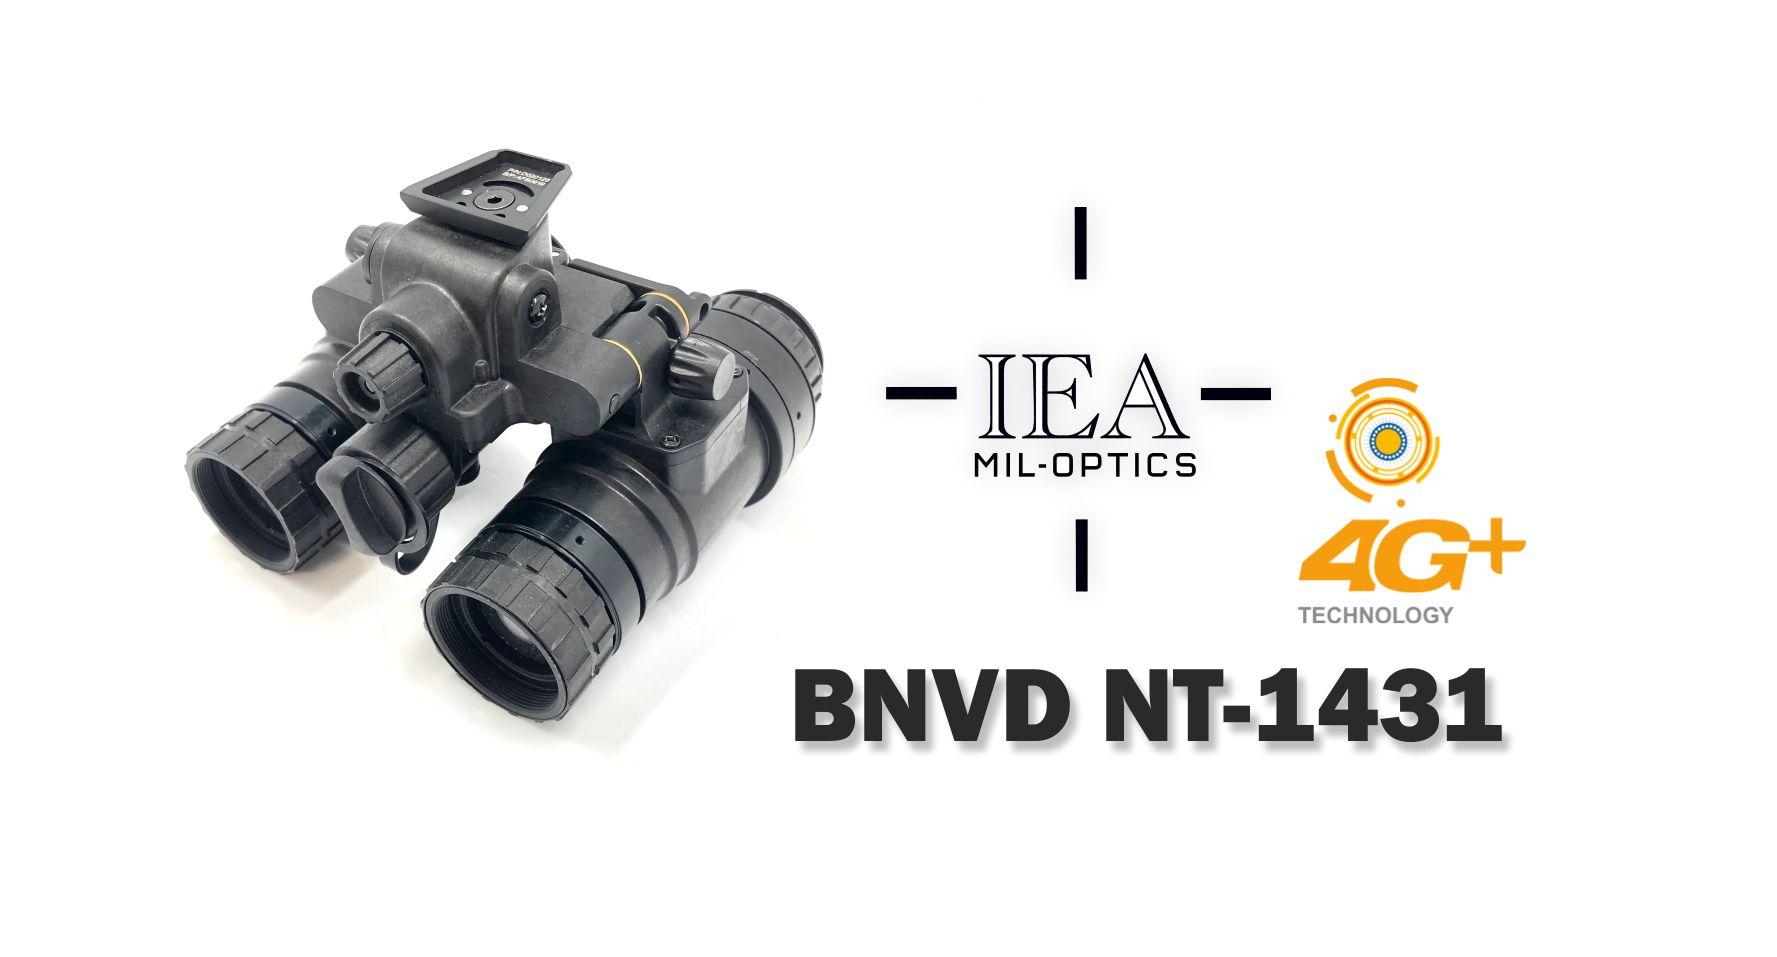 BNVD-4G